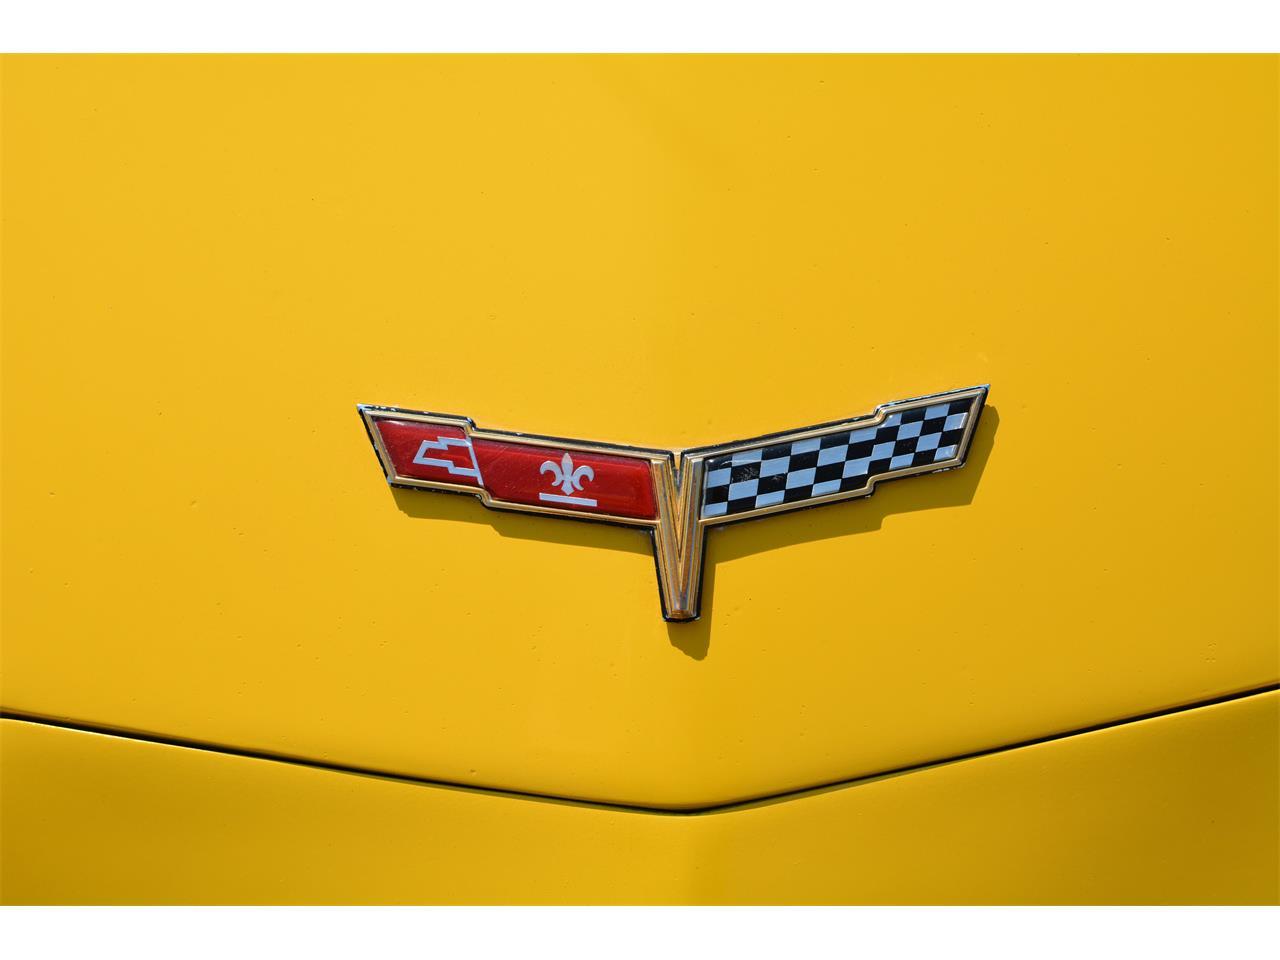 Large Picture of '81 Corvette located in Wittmann Arizona - $14,000.00 - LGQ7